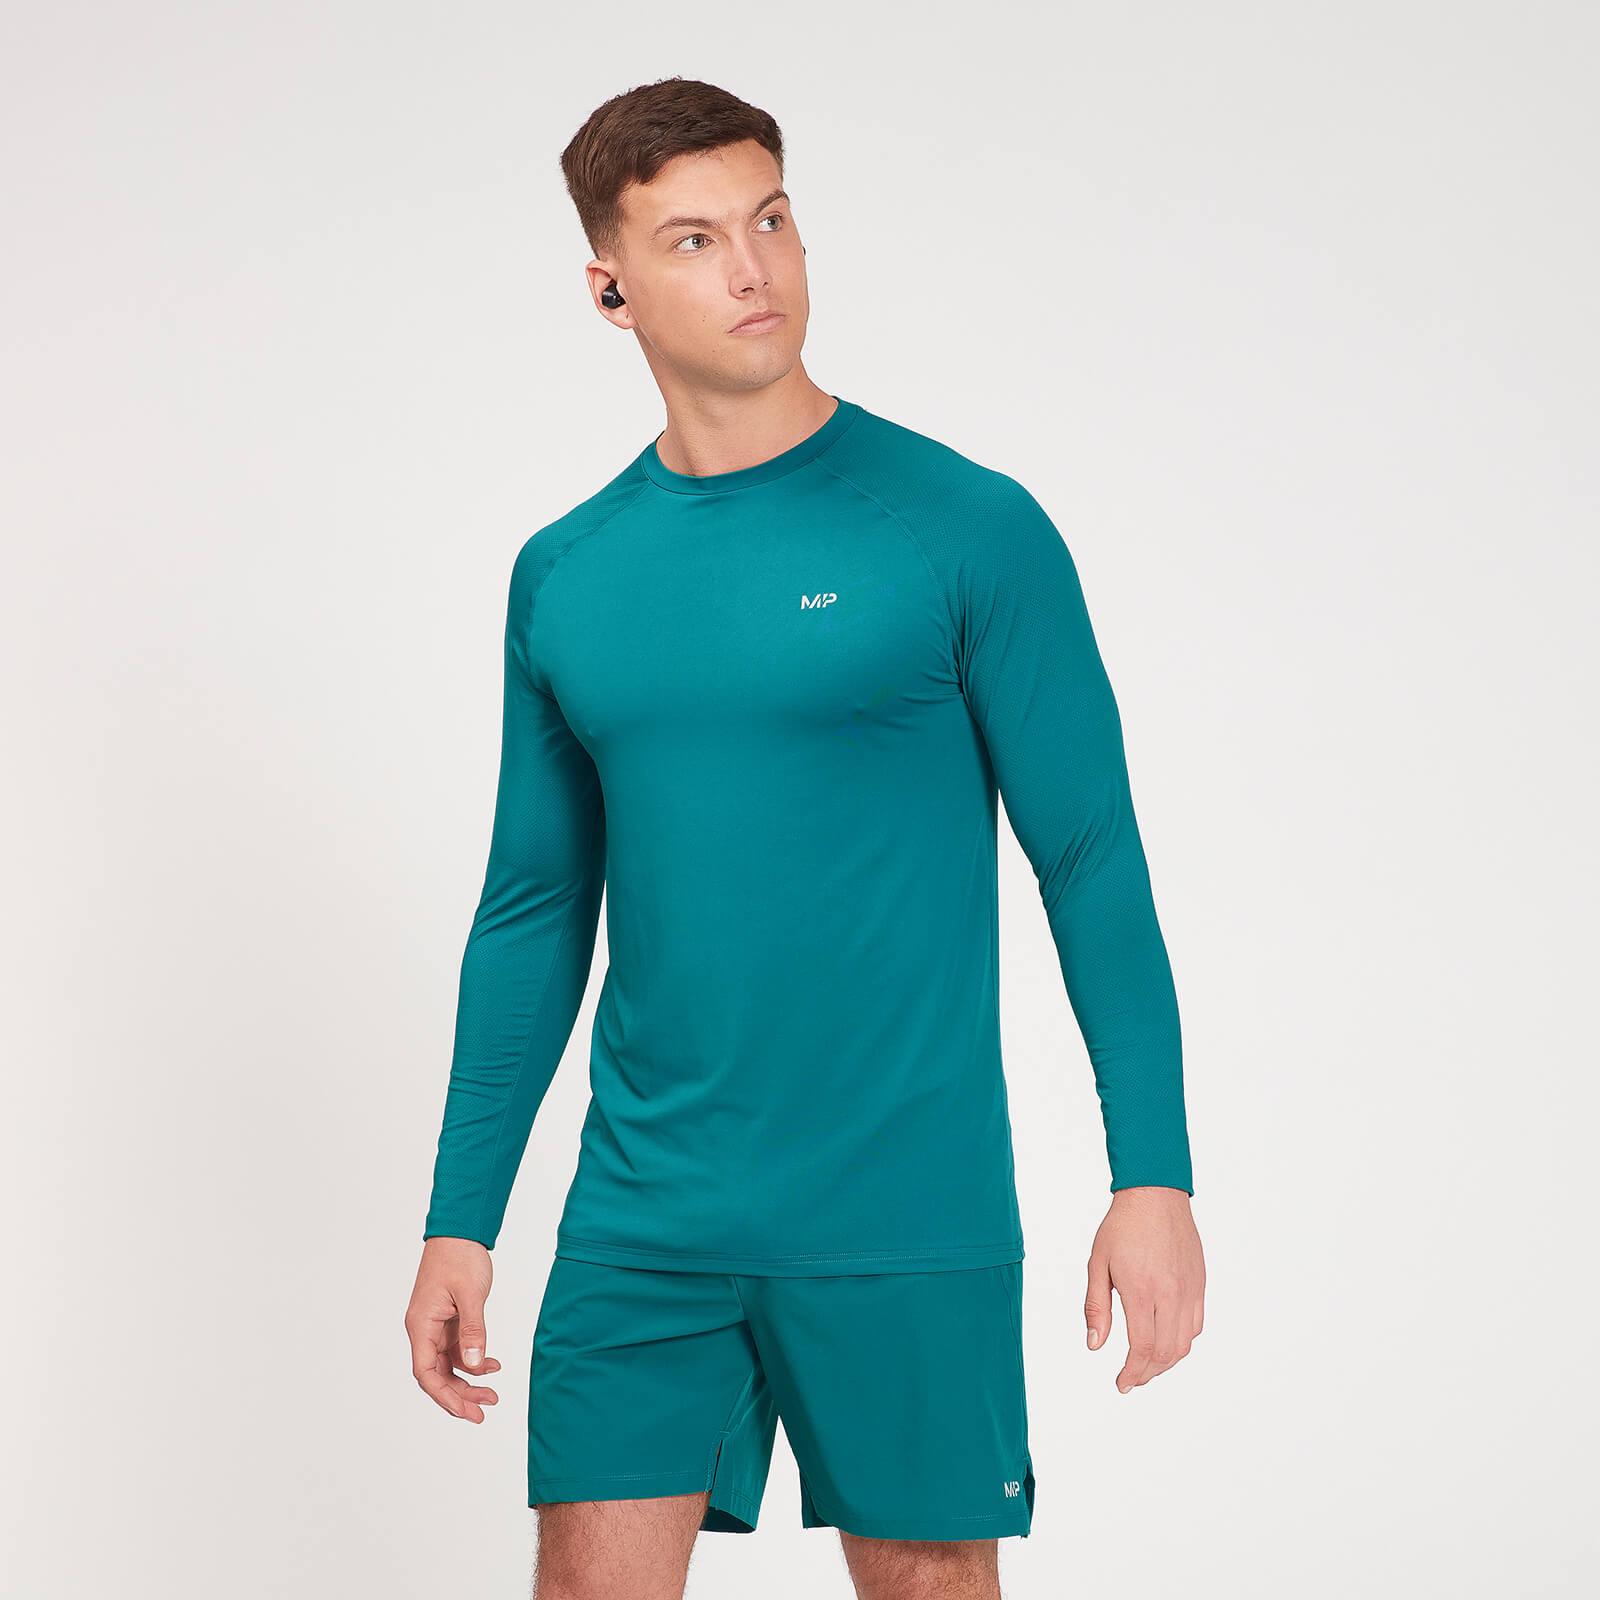 Купить MP Men's Velocity Long Sleeve Top - Teal - XL, Myprotein International